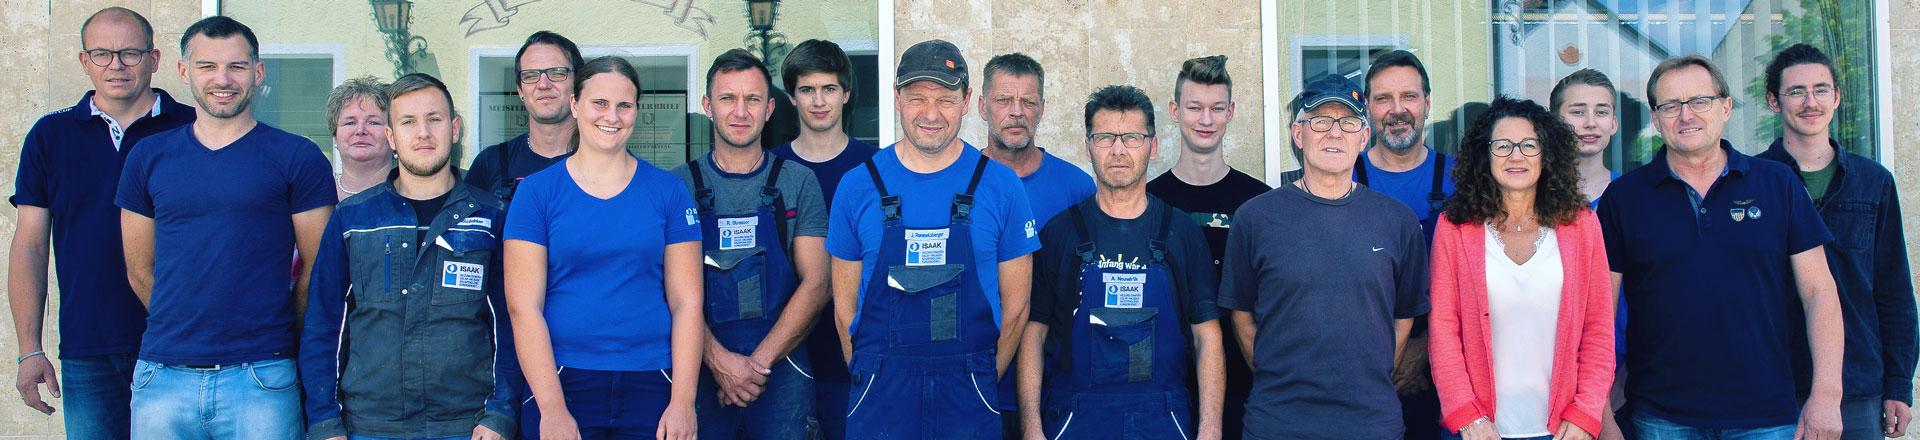 Team Mitarbeiter Firma Isaak